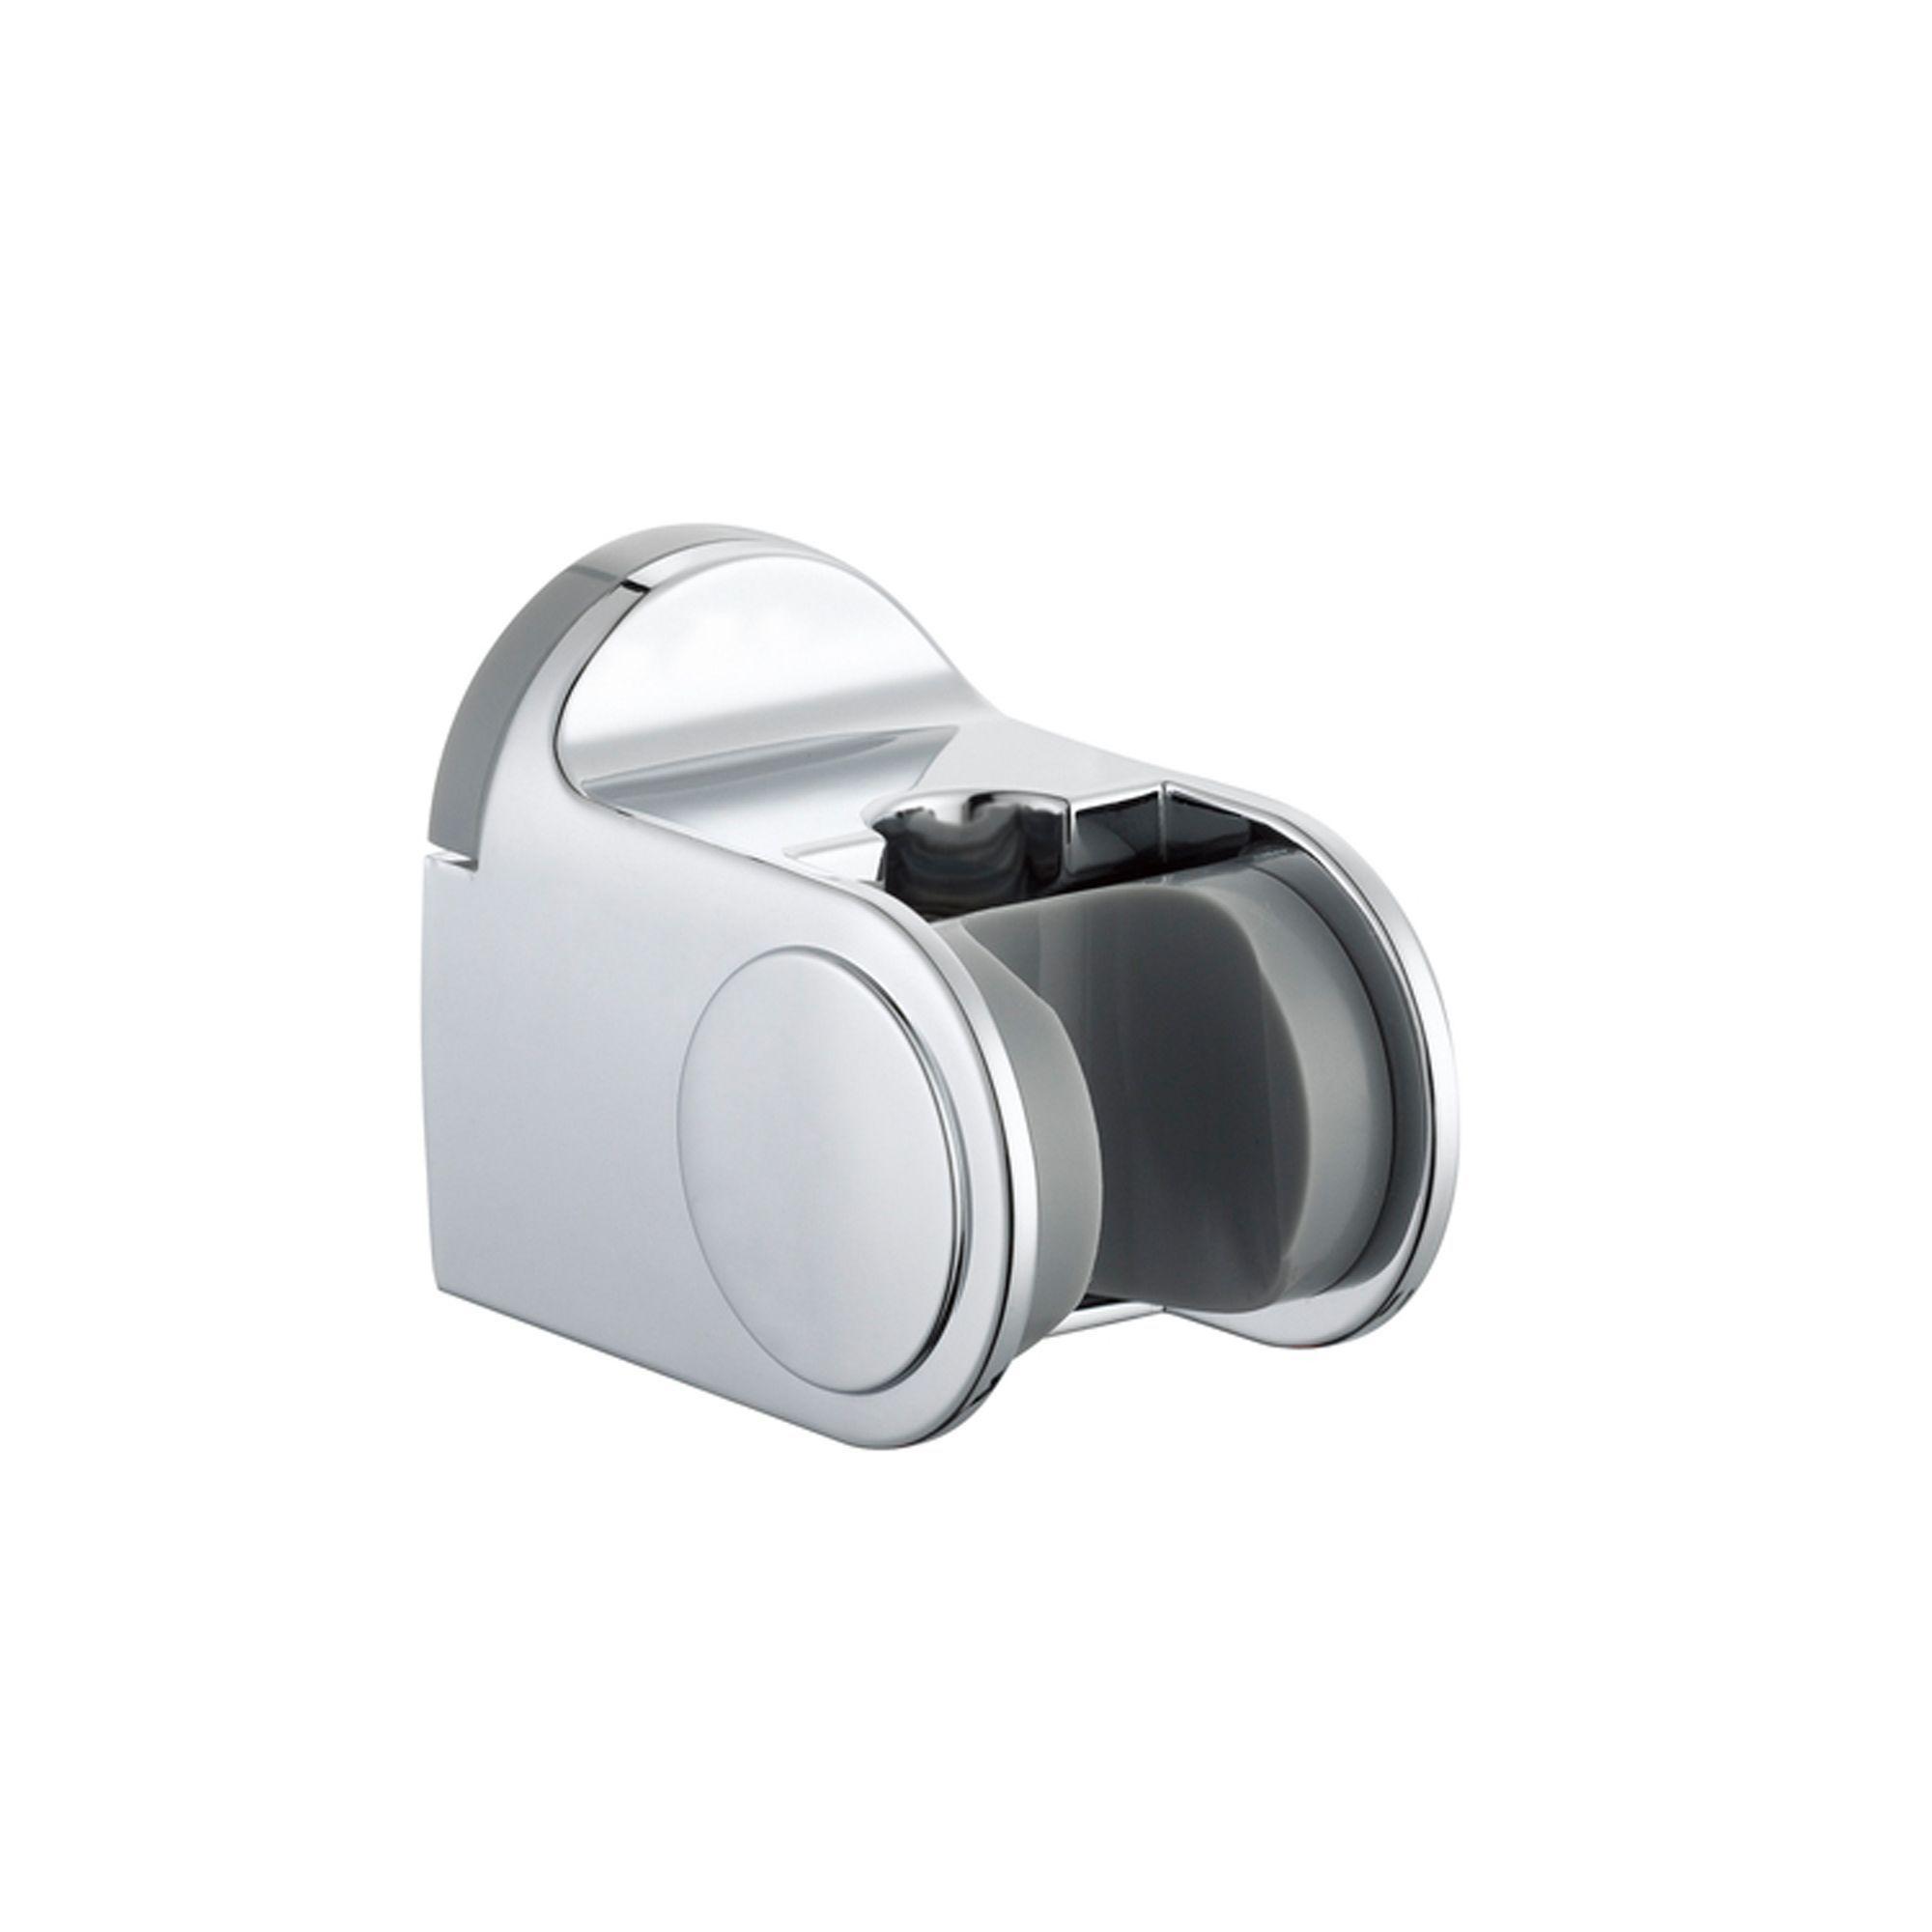 b&q kitchens kitchen kraft cabinets b&q silver chrome effect shower head holder | departments ...